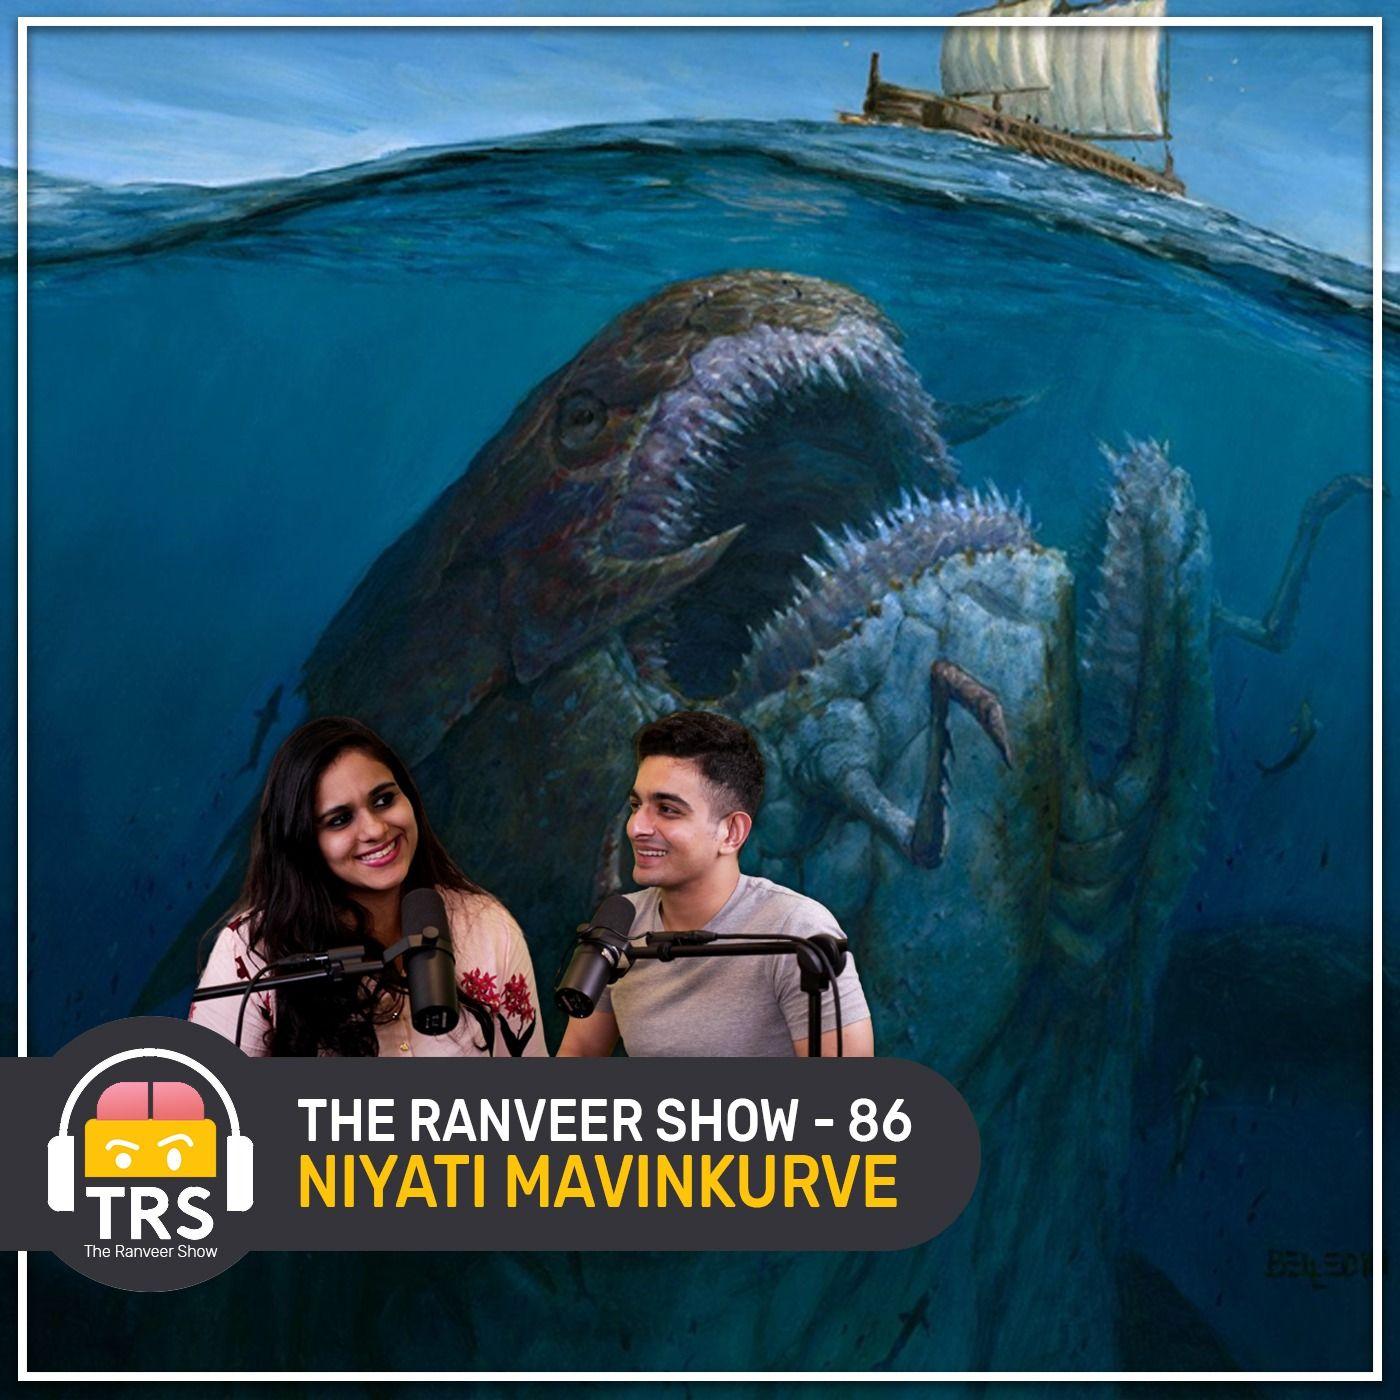 Sea Monsters, Beasts & REALITY About The Oceans ft. Niyati Mavinkurve | The Ranveer Show 86